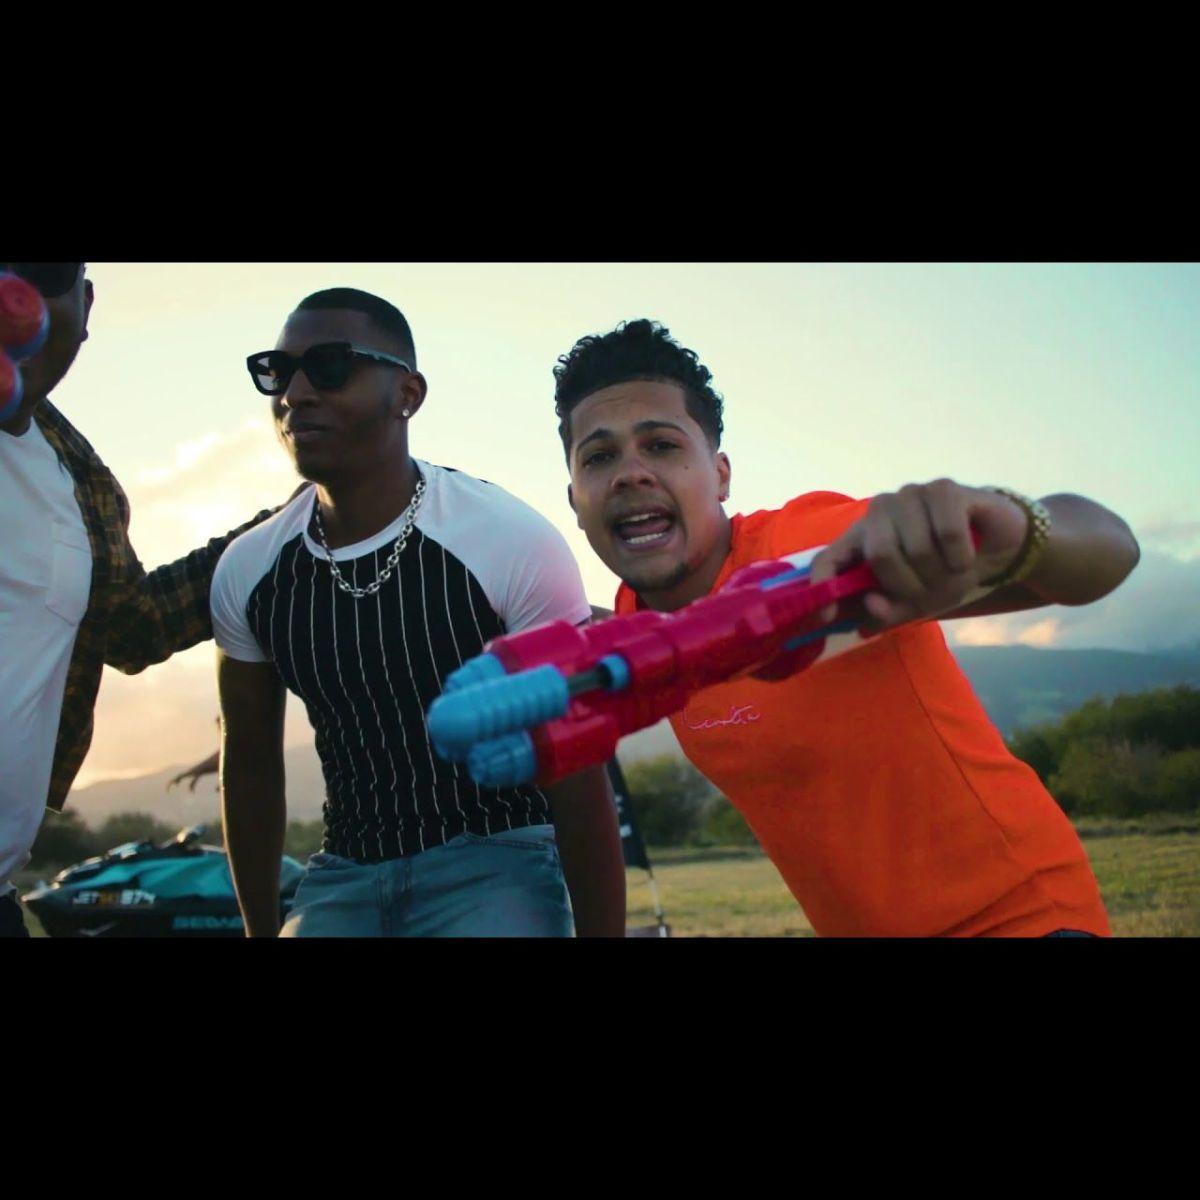 PLL - Ocho (ft. DJ Sebb) (Thumbnail)